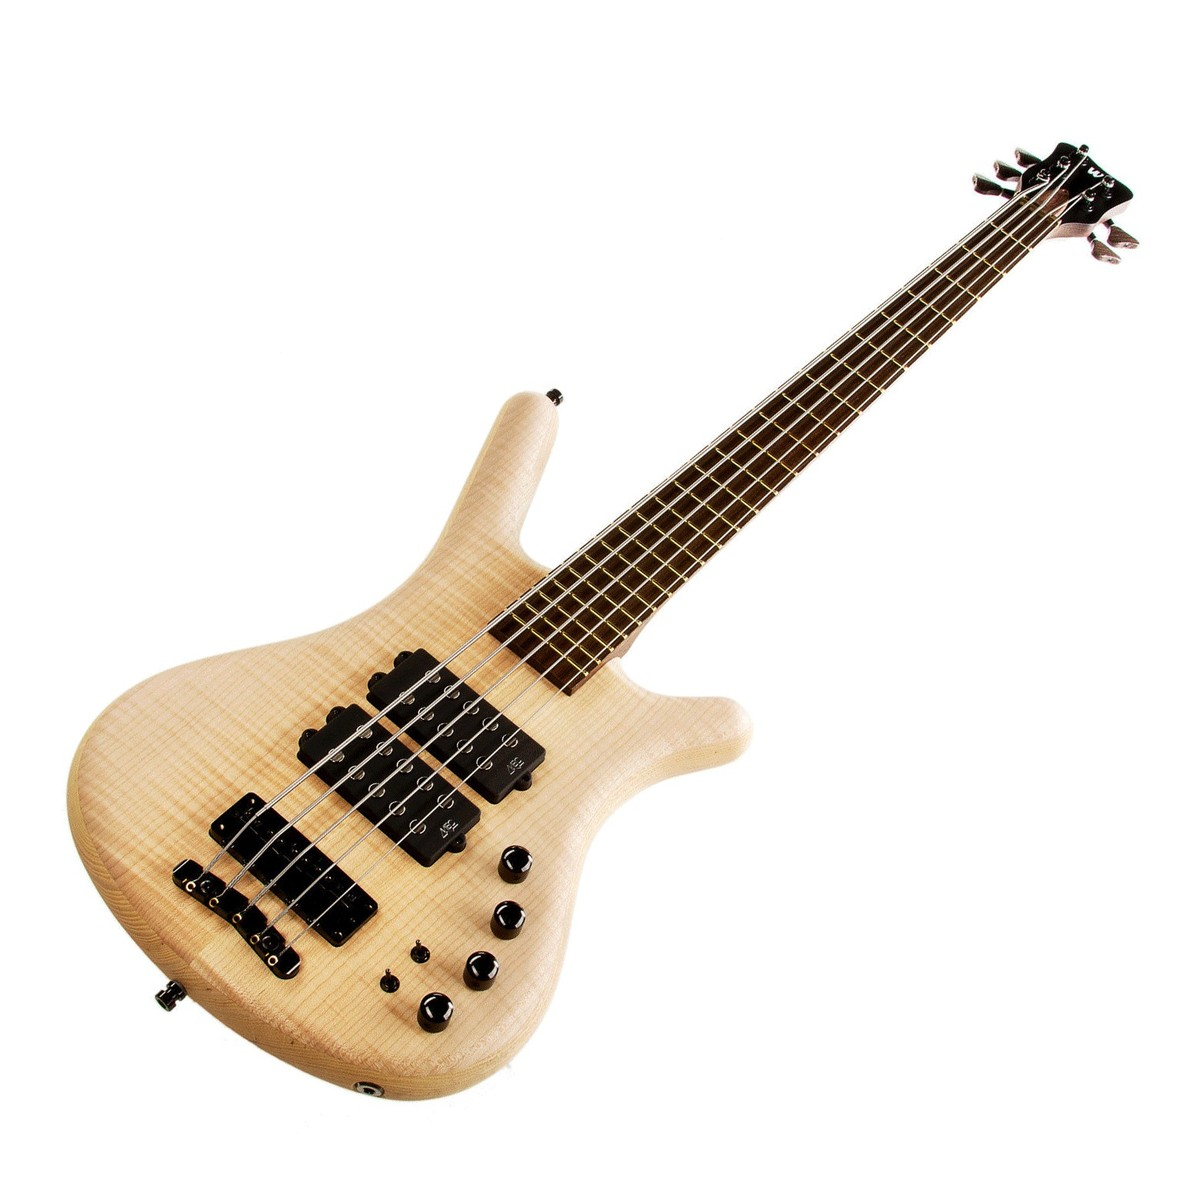 Warwick Corvette 5 String Bass Guitar Natural At